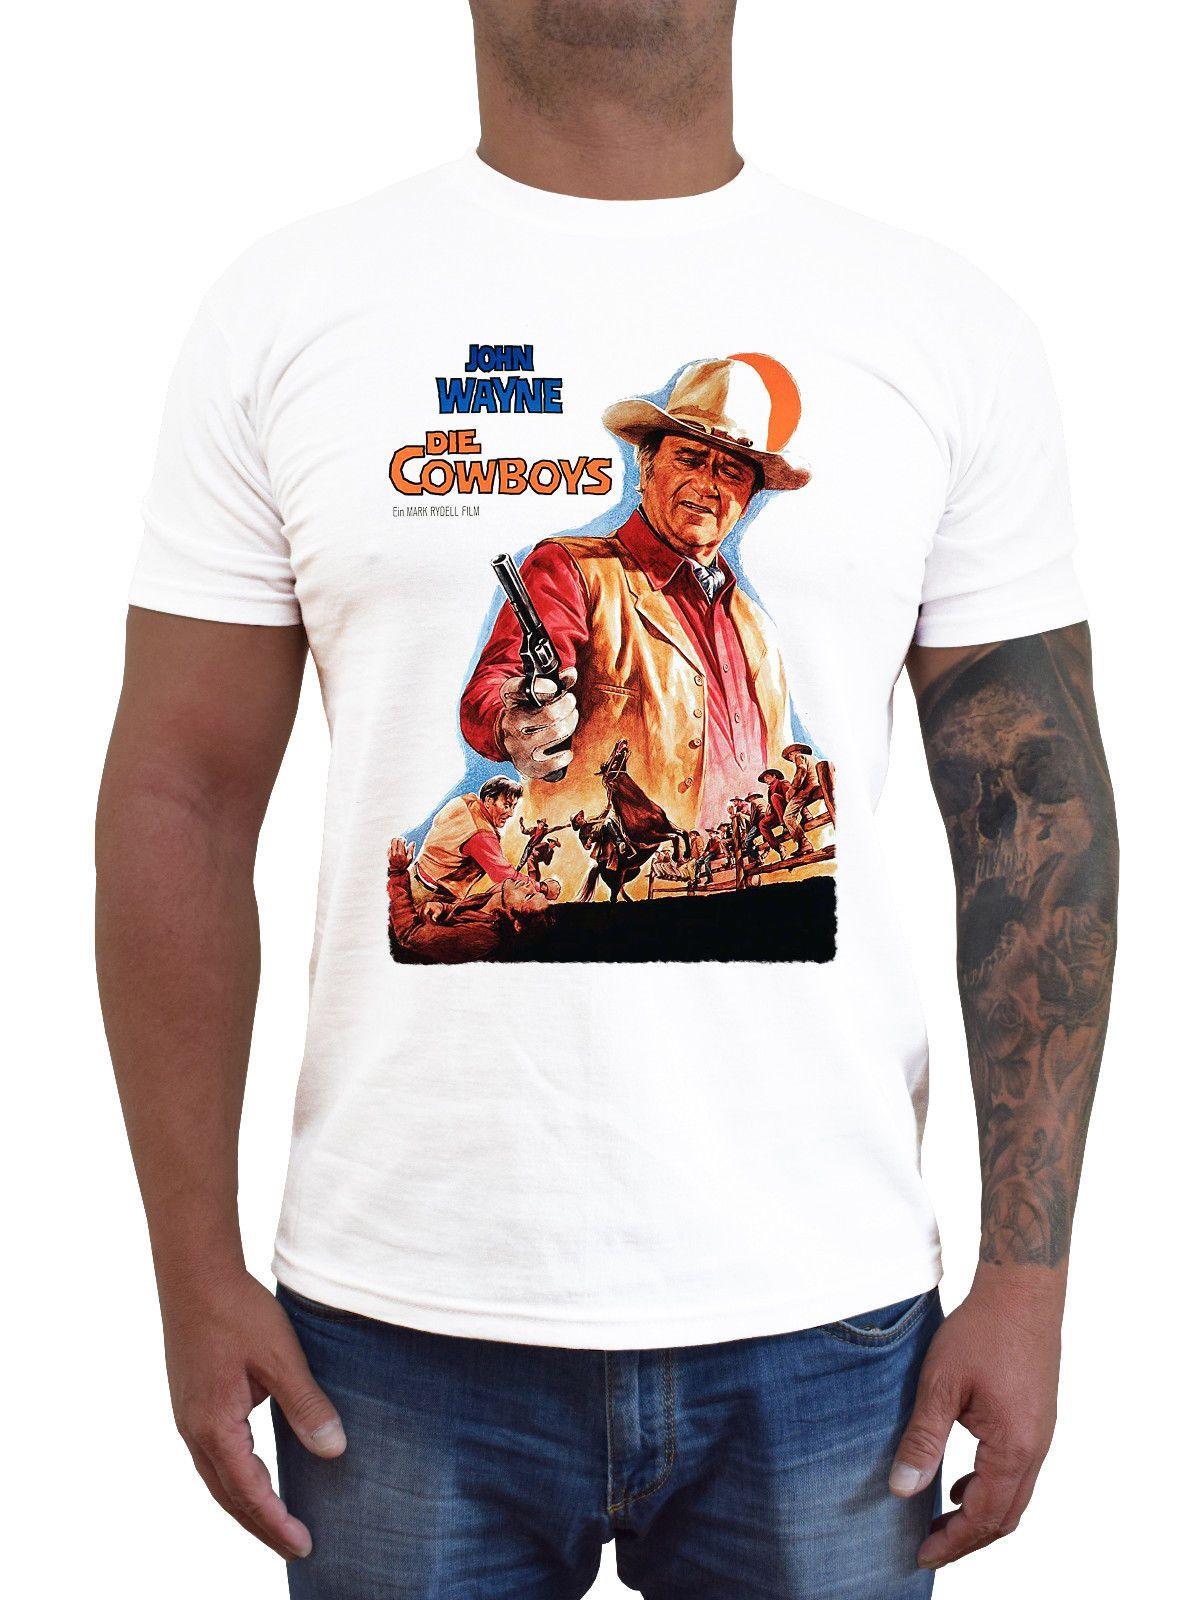 c8930f6b DIE COWBOYS Ver. 1 John Wayne T Shirt White S 5XLFunny Unisex Casual Top T  Shirt Buy Online Crazy Tee Shirts From Dragontee, $10.28| DHgate.Com